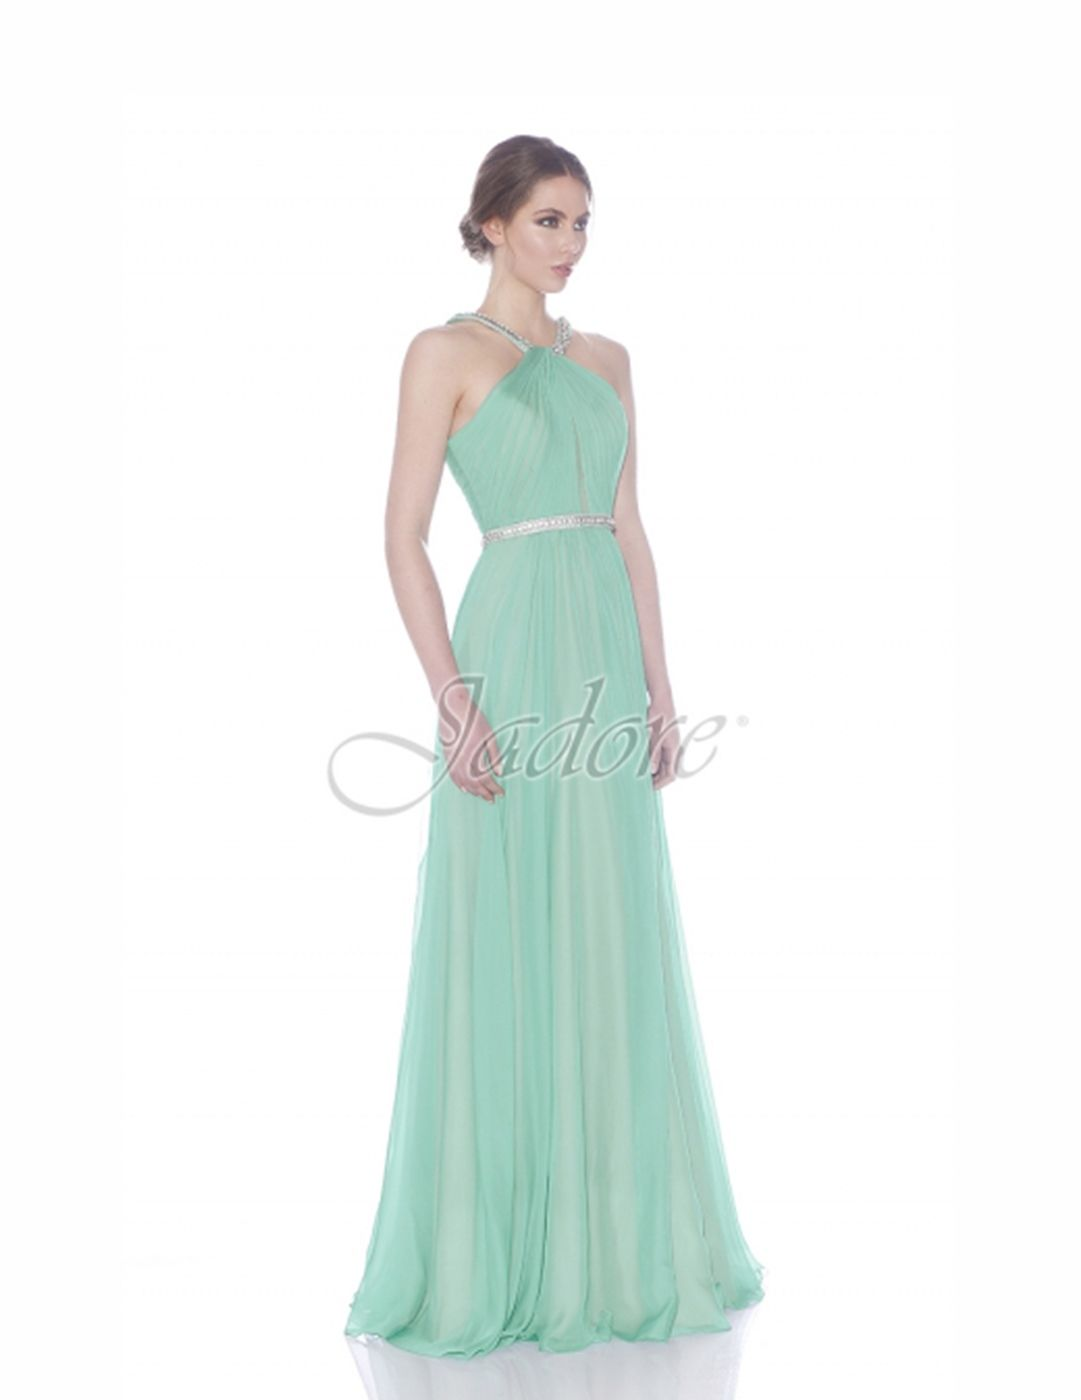 74e016f96a6 View Dress - Jadore J7 Collection - J7019